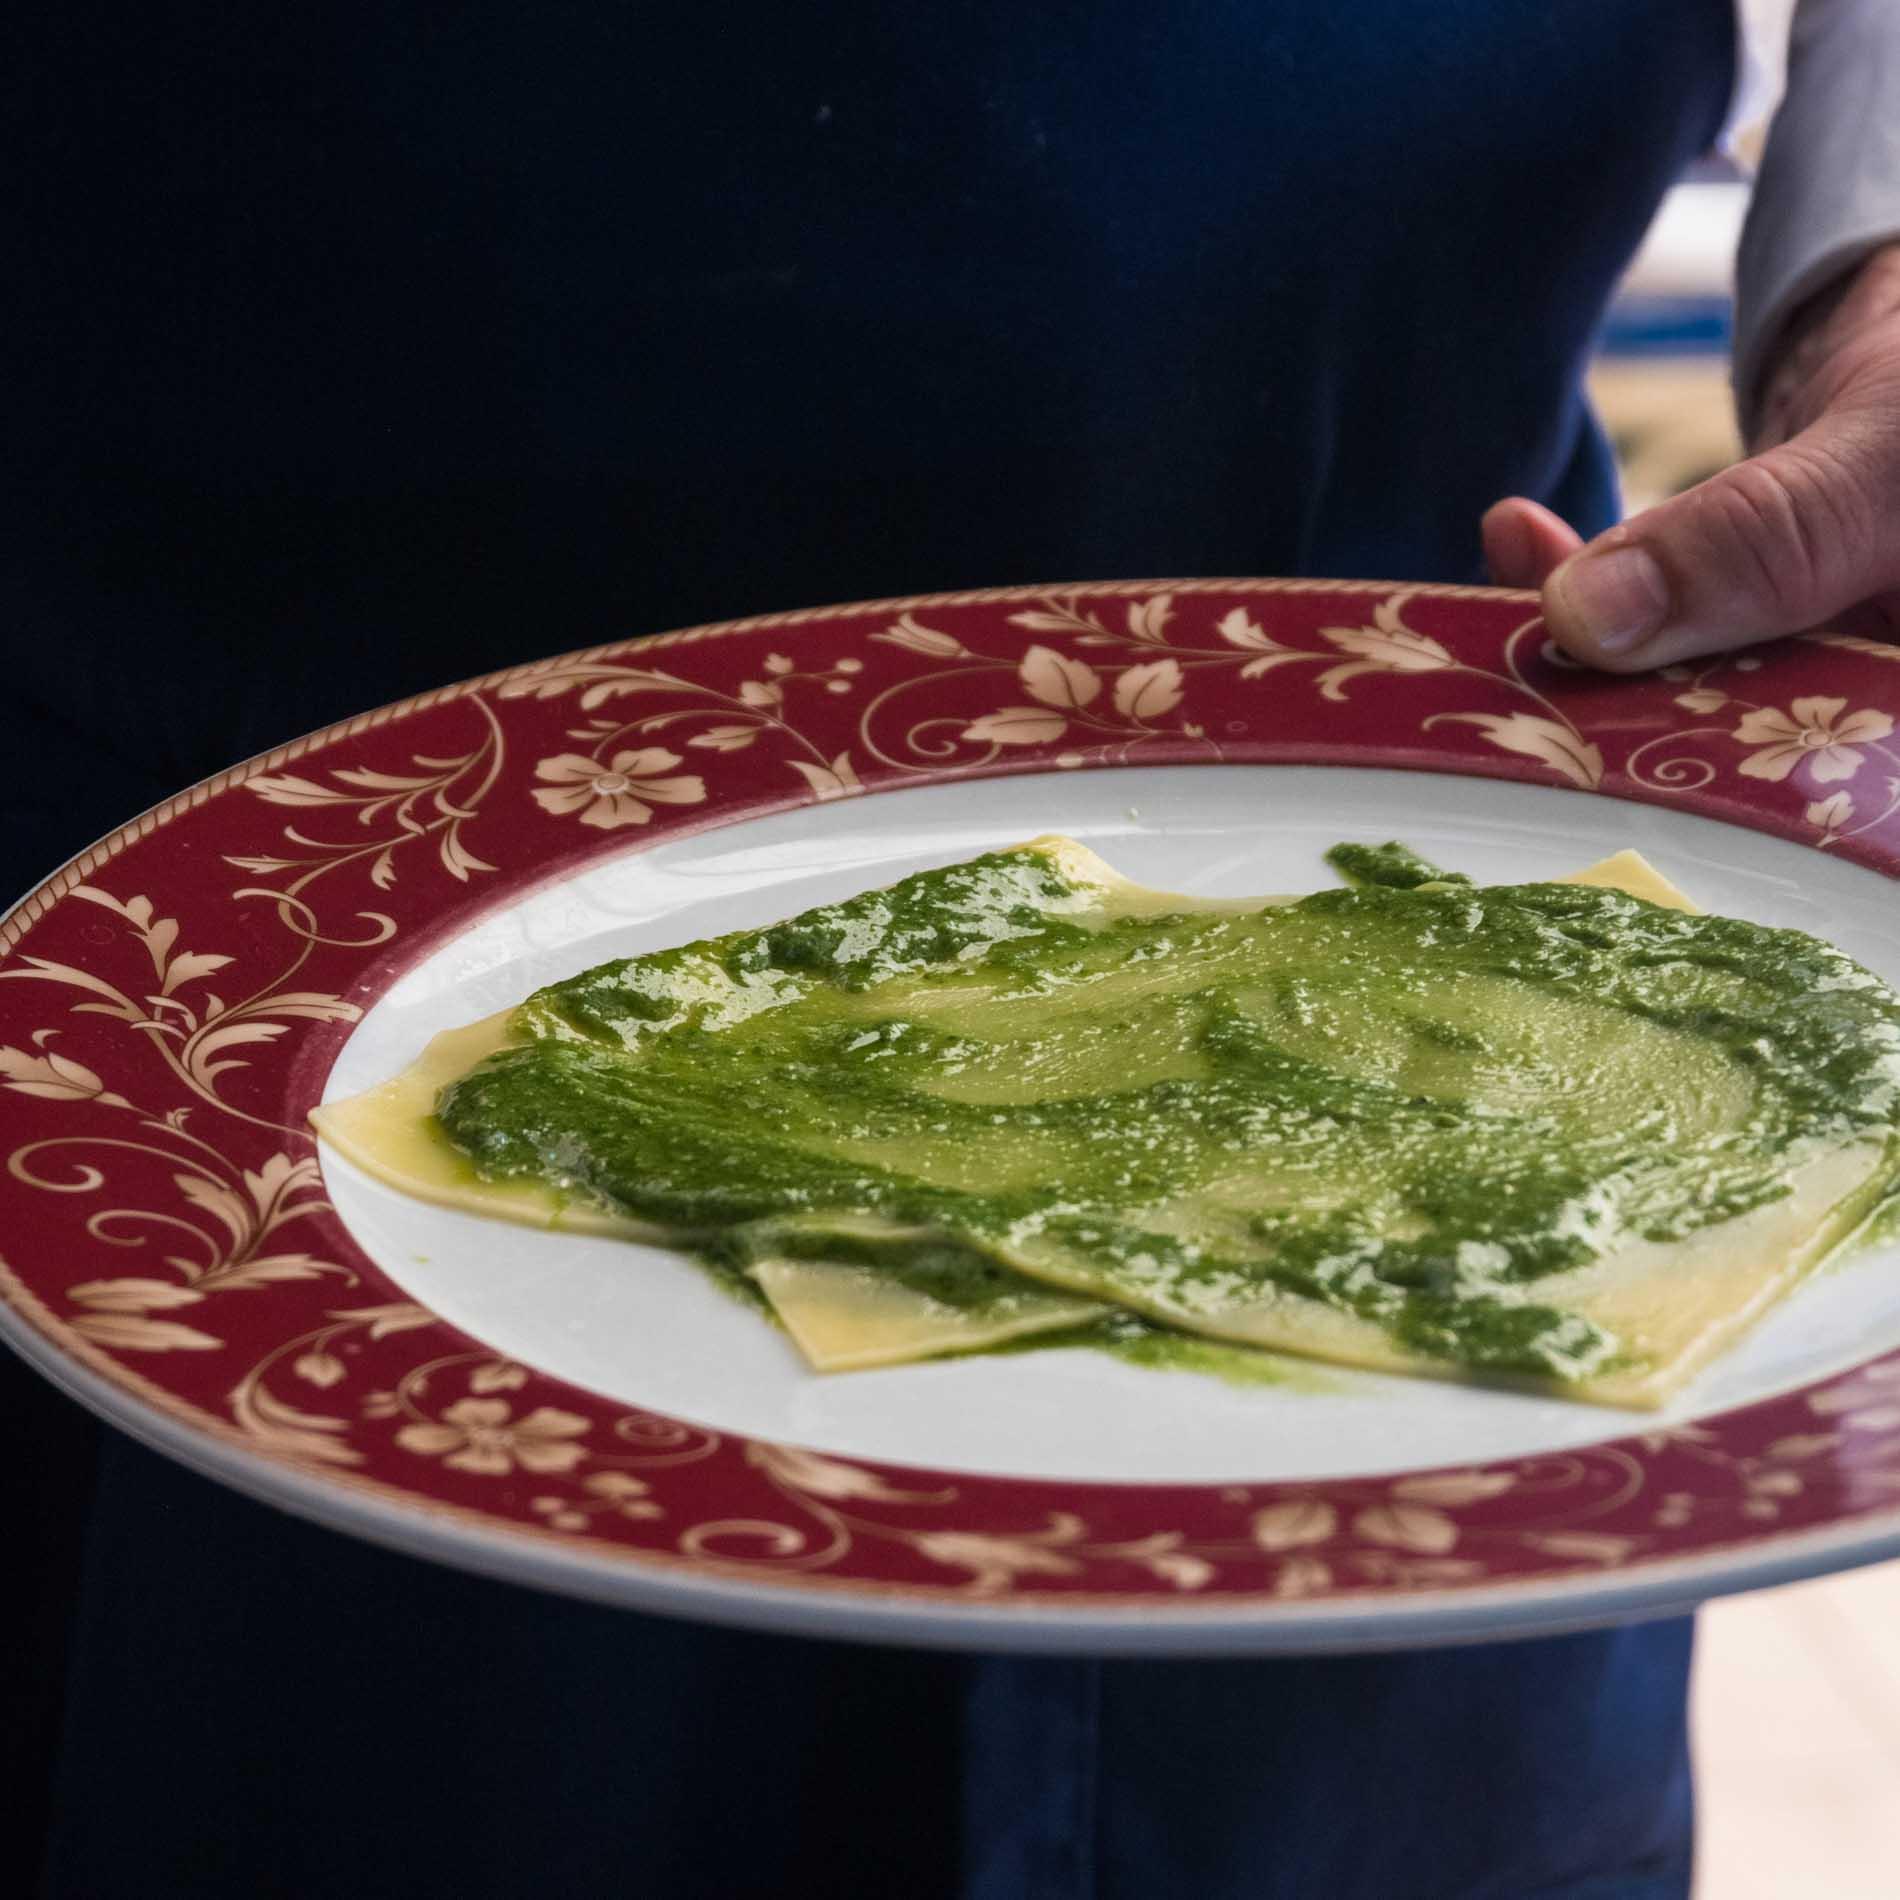 la-piedigrotta-ristorante-da-carmine-e-antonio-213